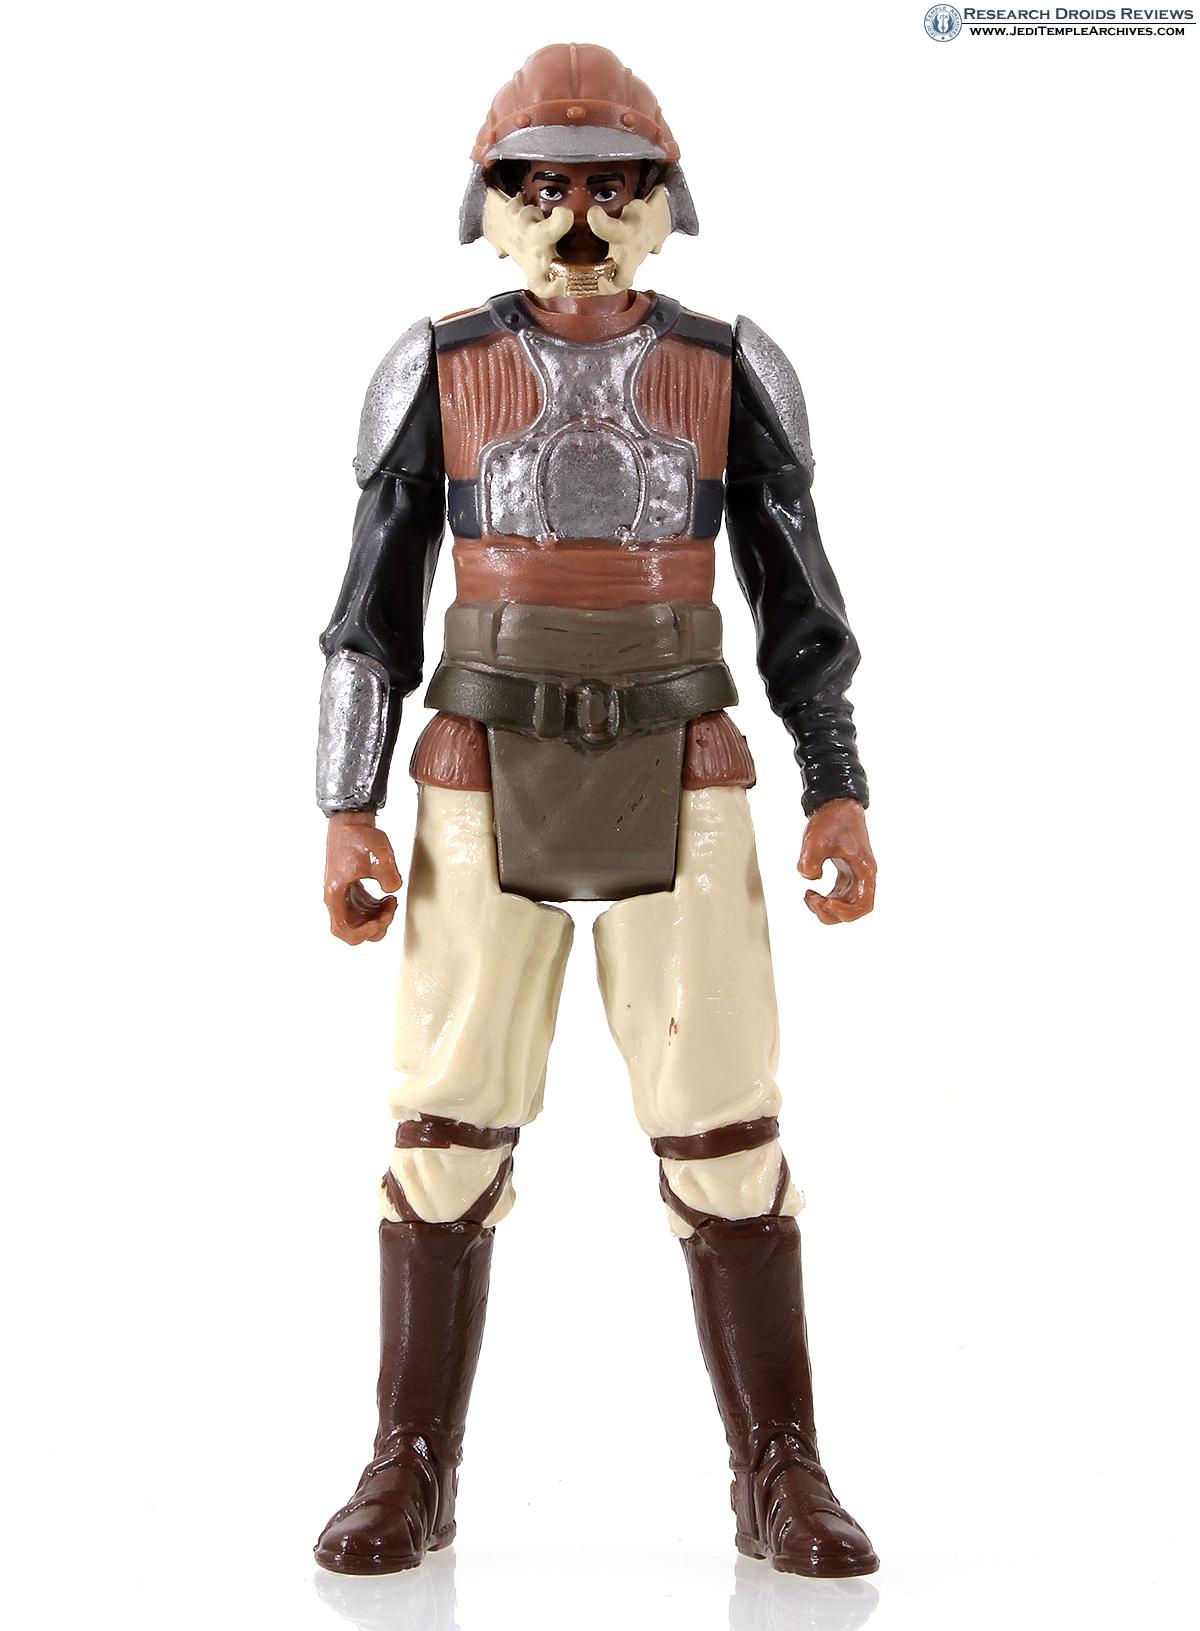 Lando Calrissian Skiff Guard Disguise